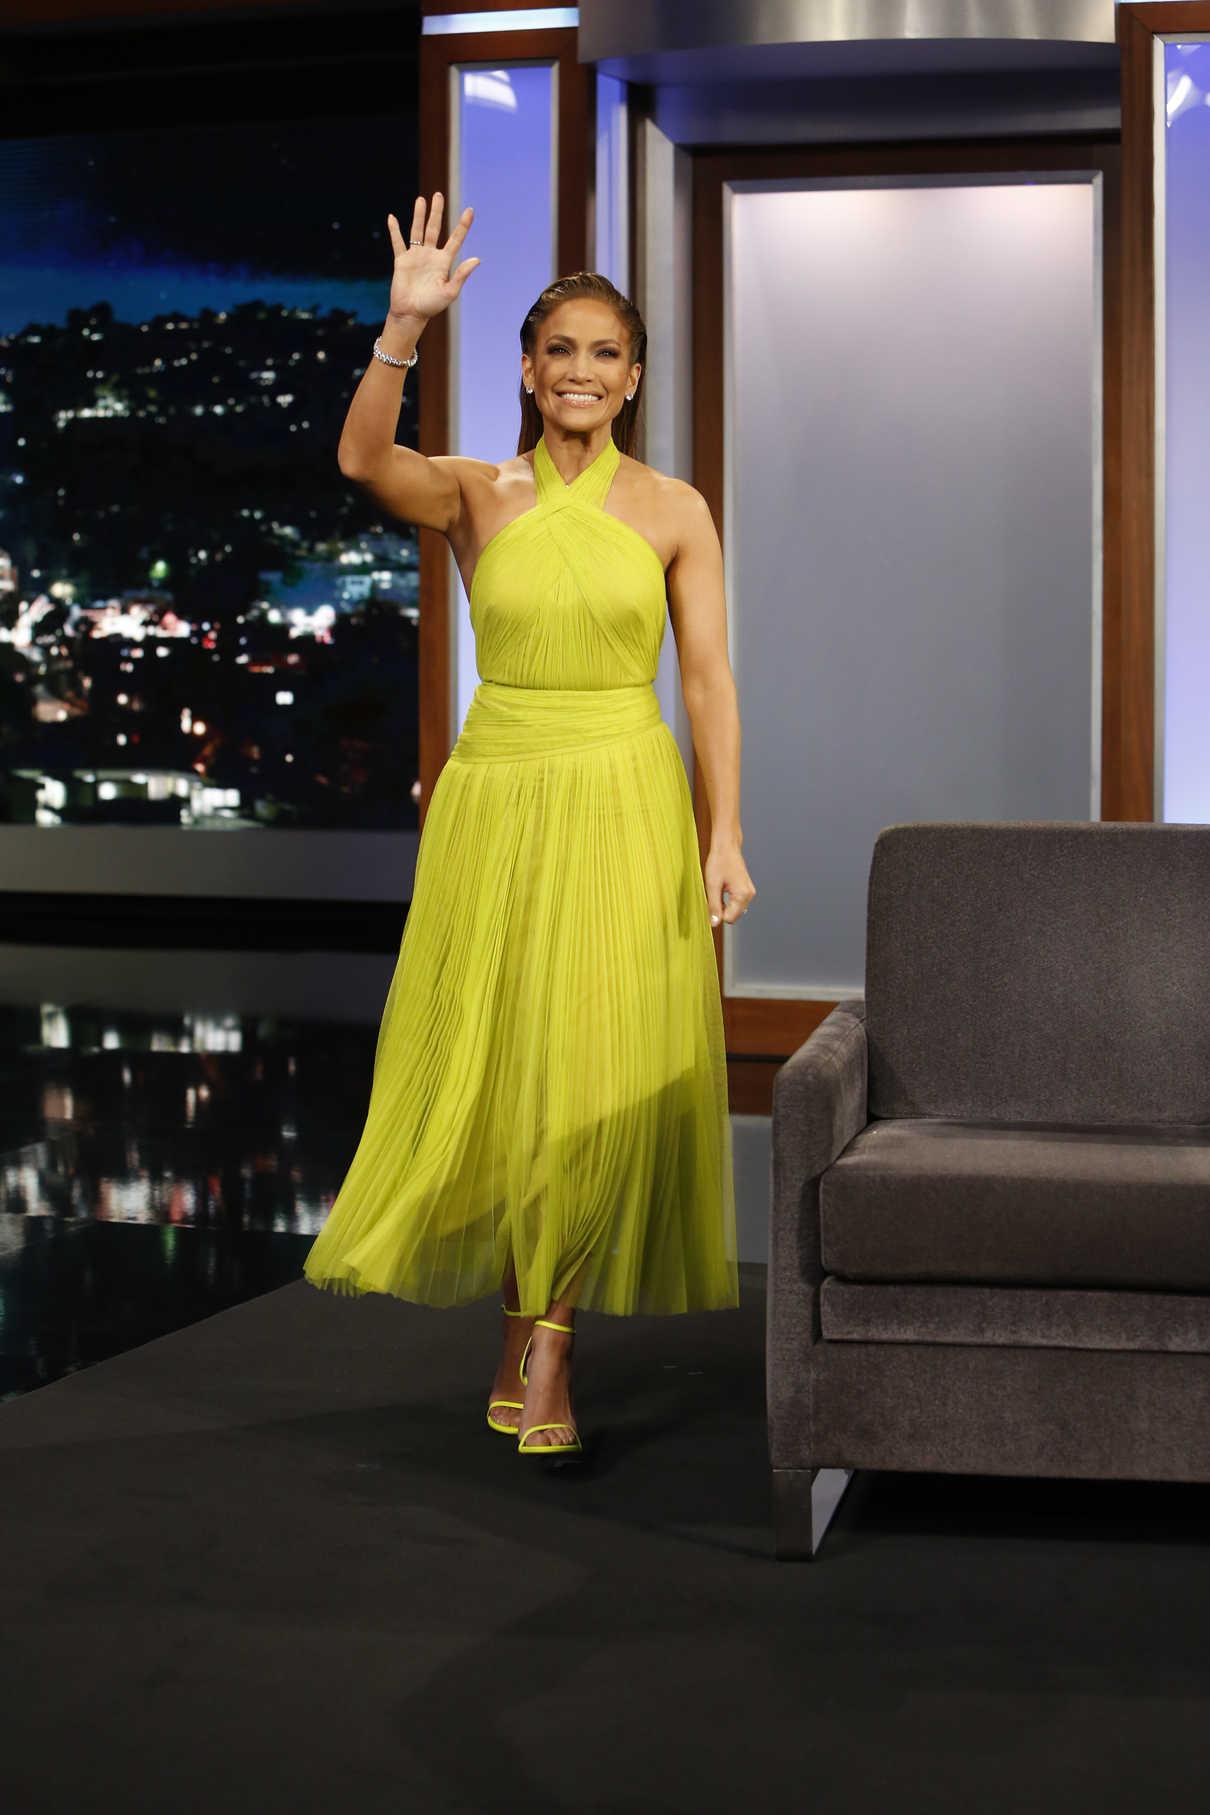 Jennifer Lopez in a Yellow Dress